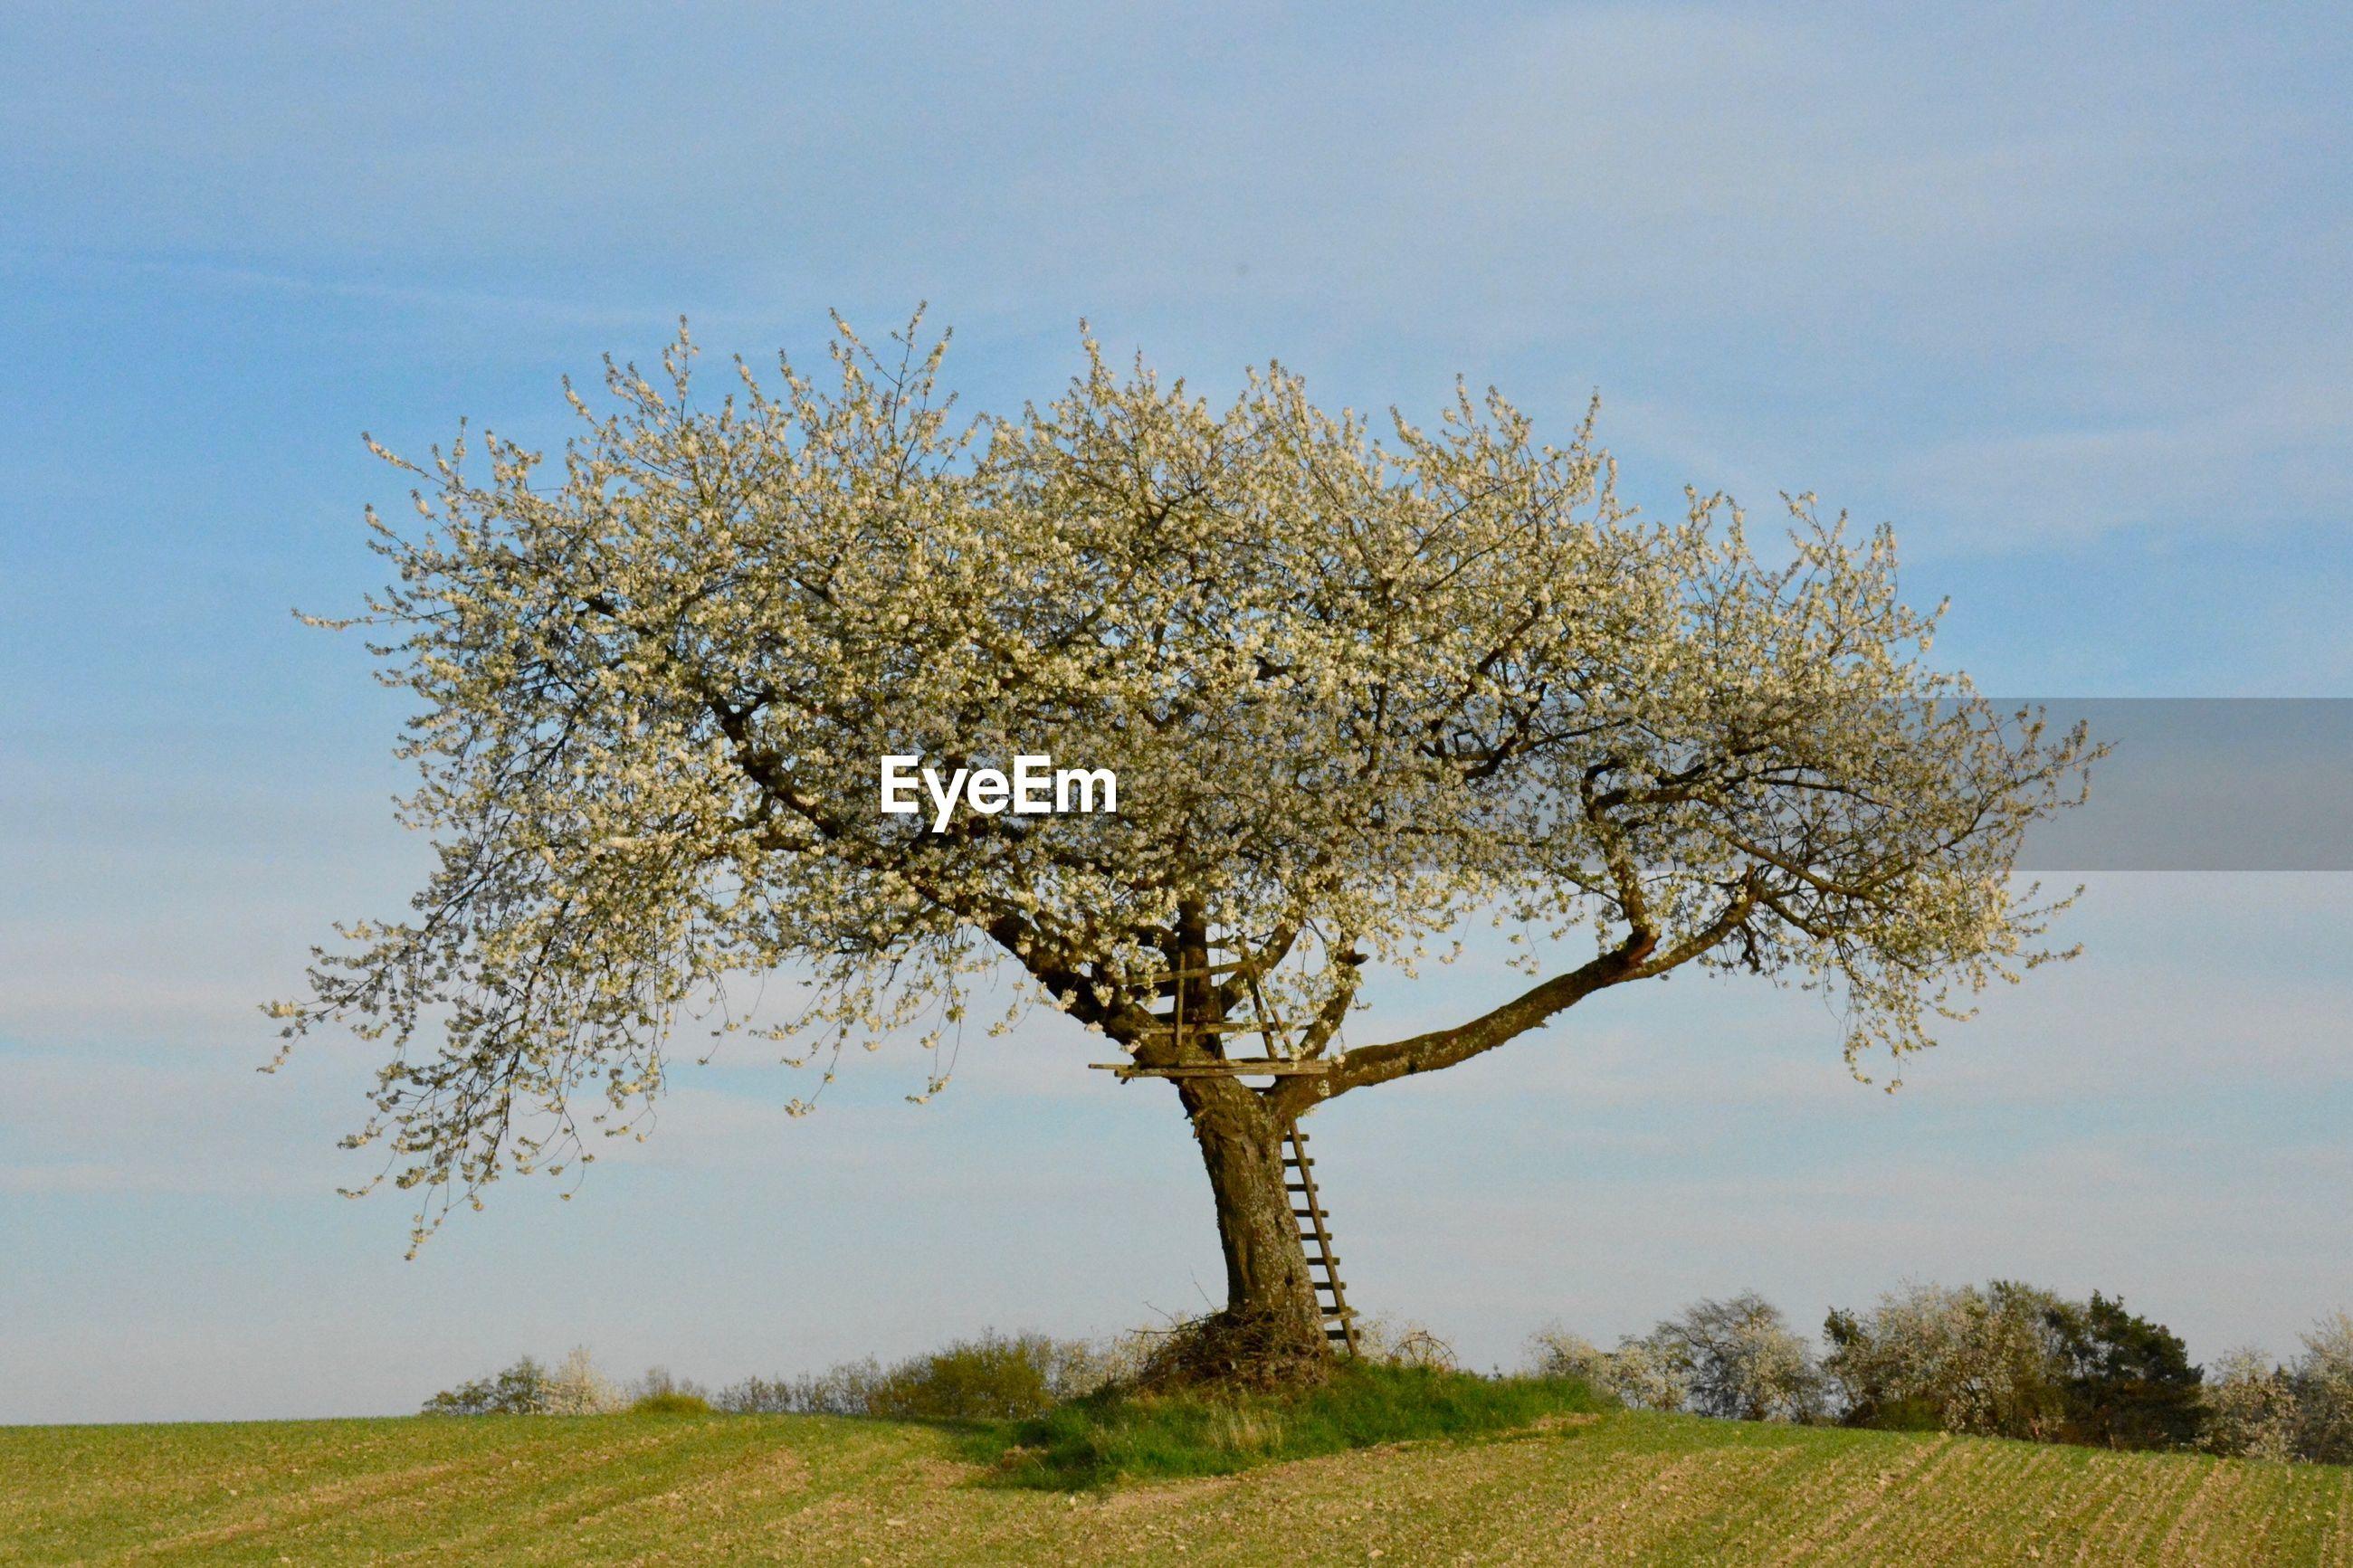 CHERRY BLOSSOM TREE ON FIELD